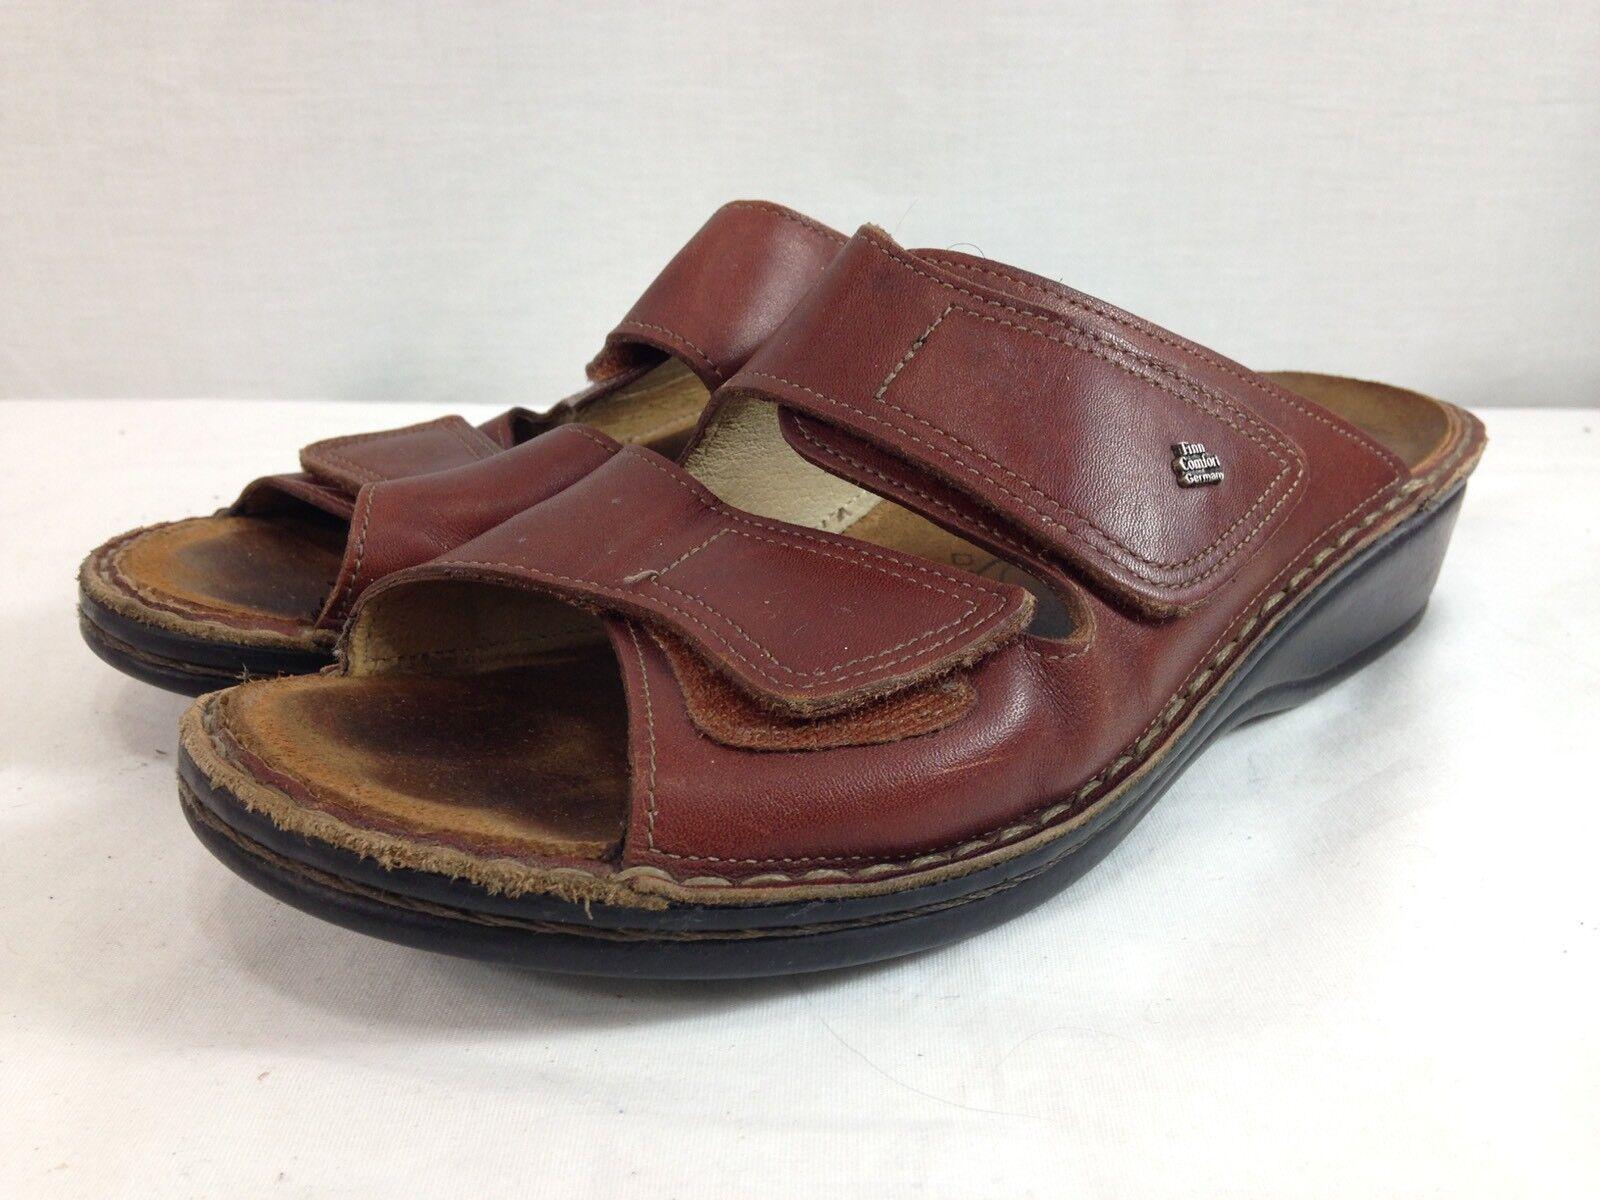 Finn Comfort 40 Sandales Schuhes Damenschuhe EU 40 Comfort US 9.5 Braun Leder Adjustable Germany cef6d8